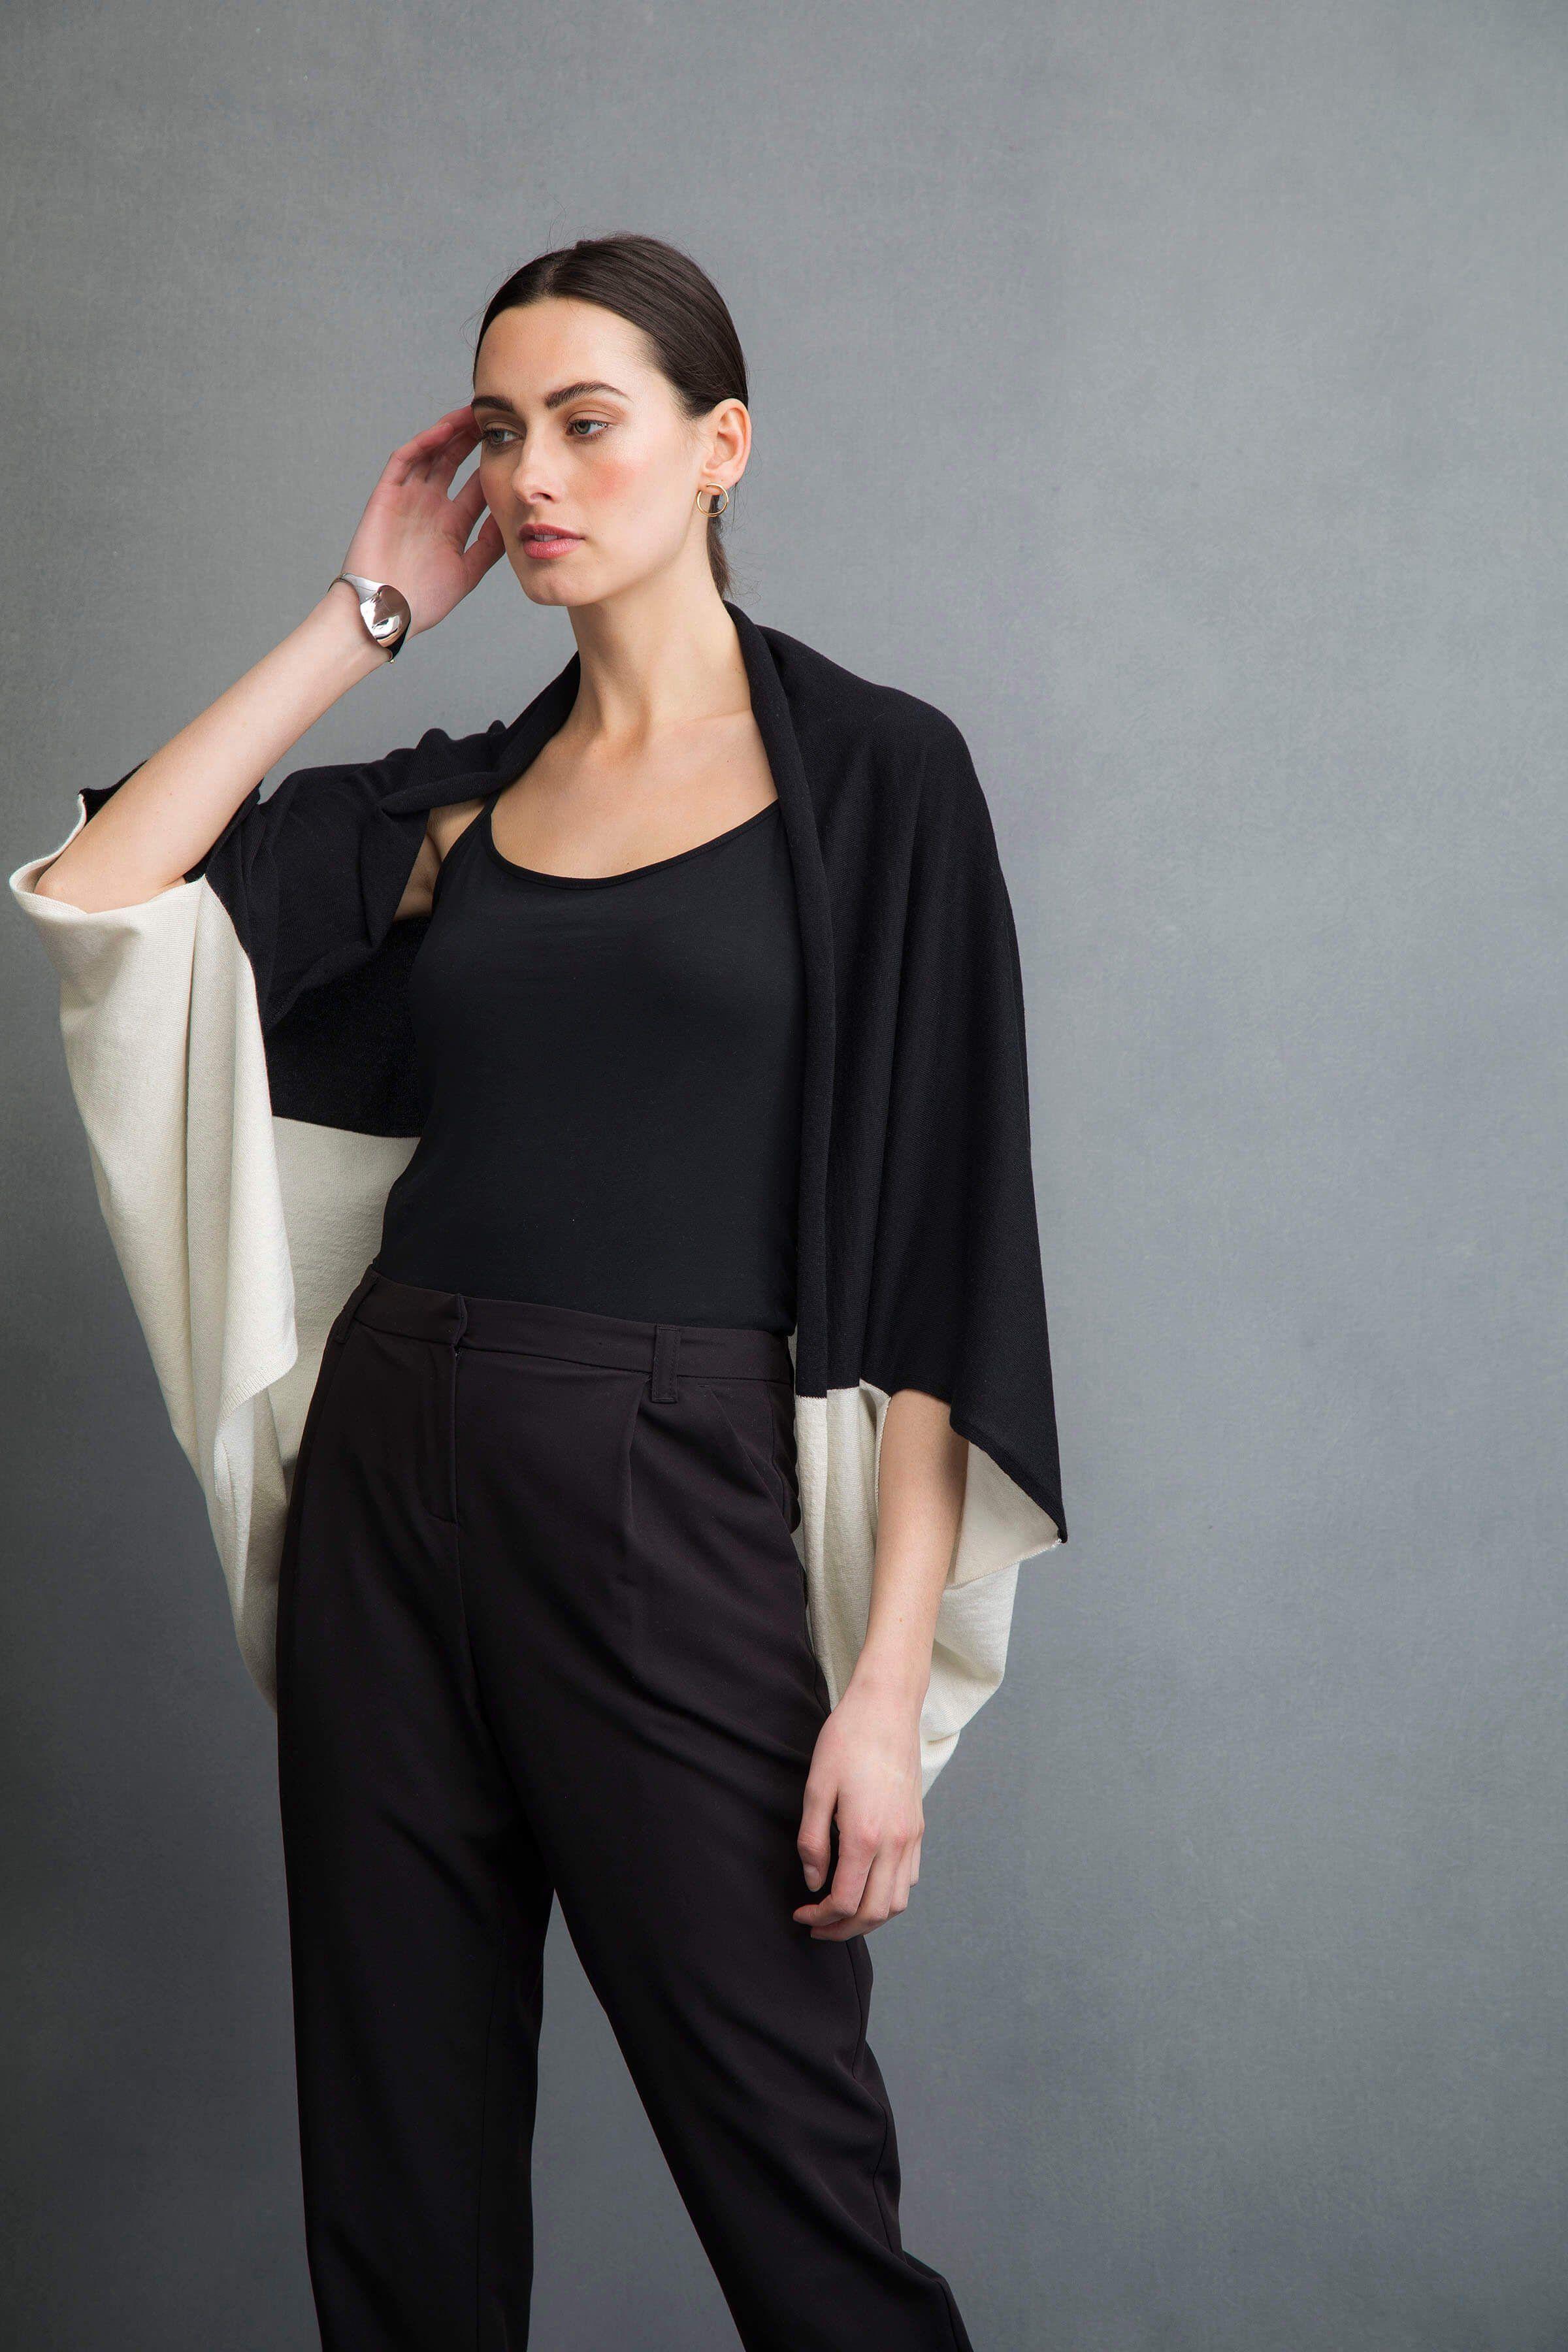 Cashmere silk shrug style cardigan in black & white